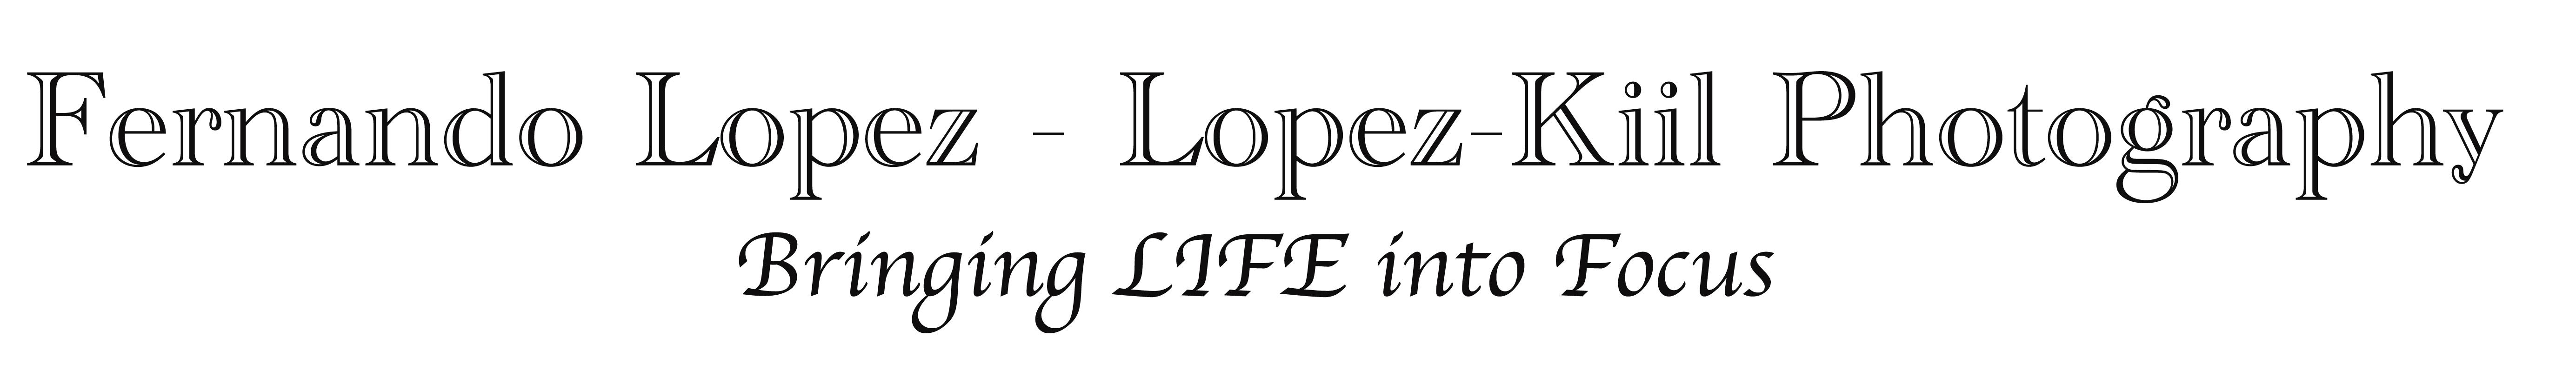 Fernando Lopez - Lopez-Kiil Photography